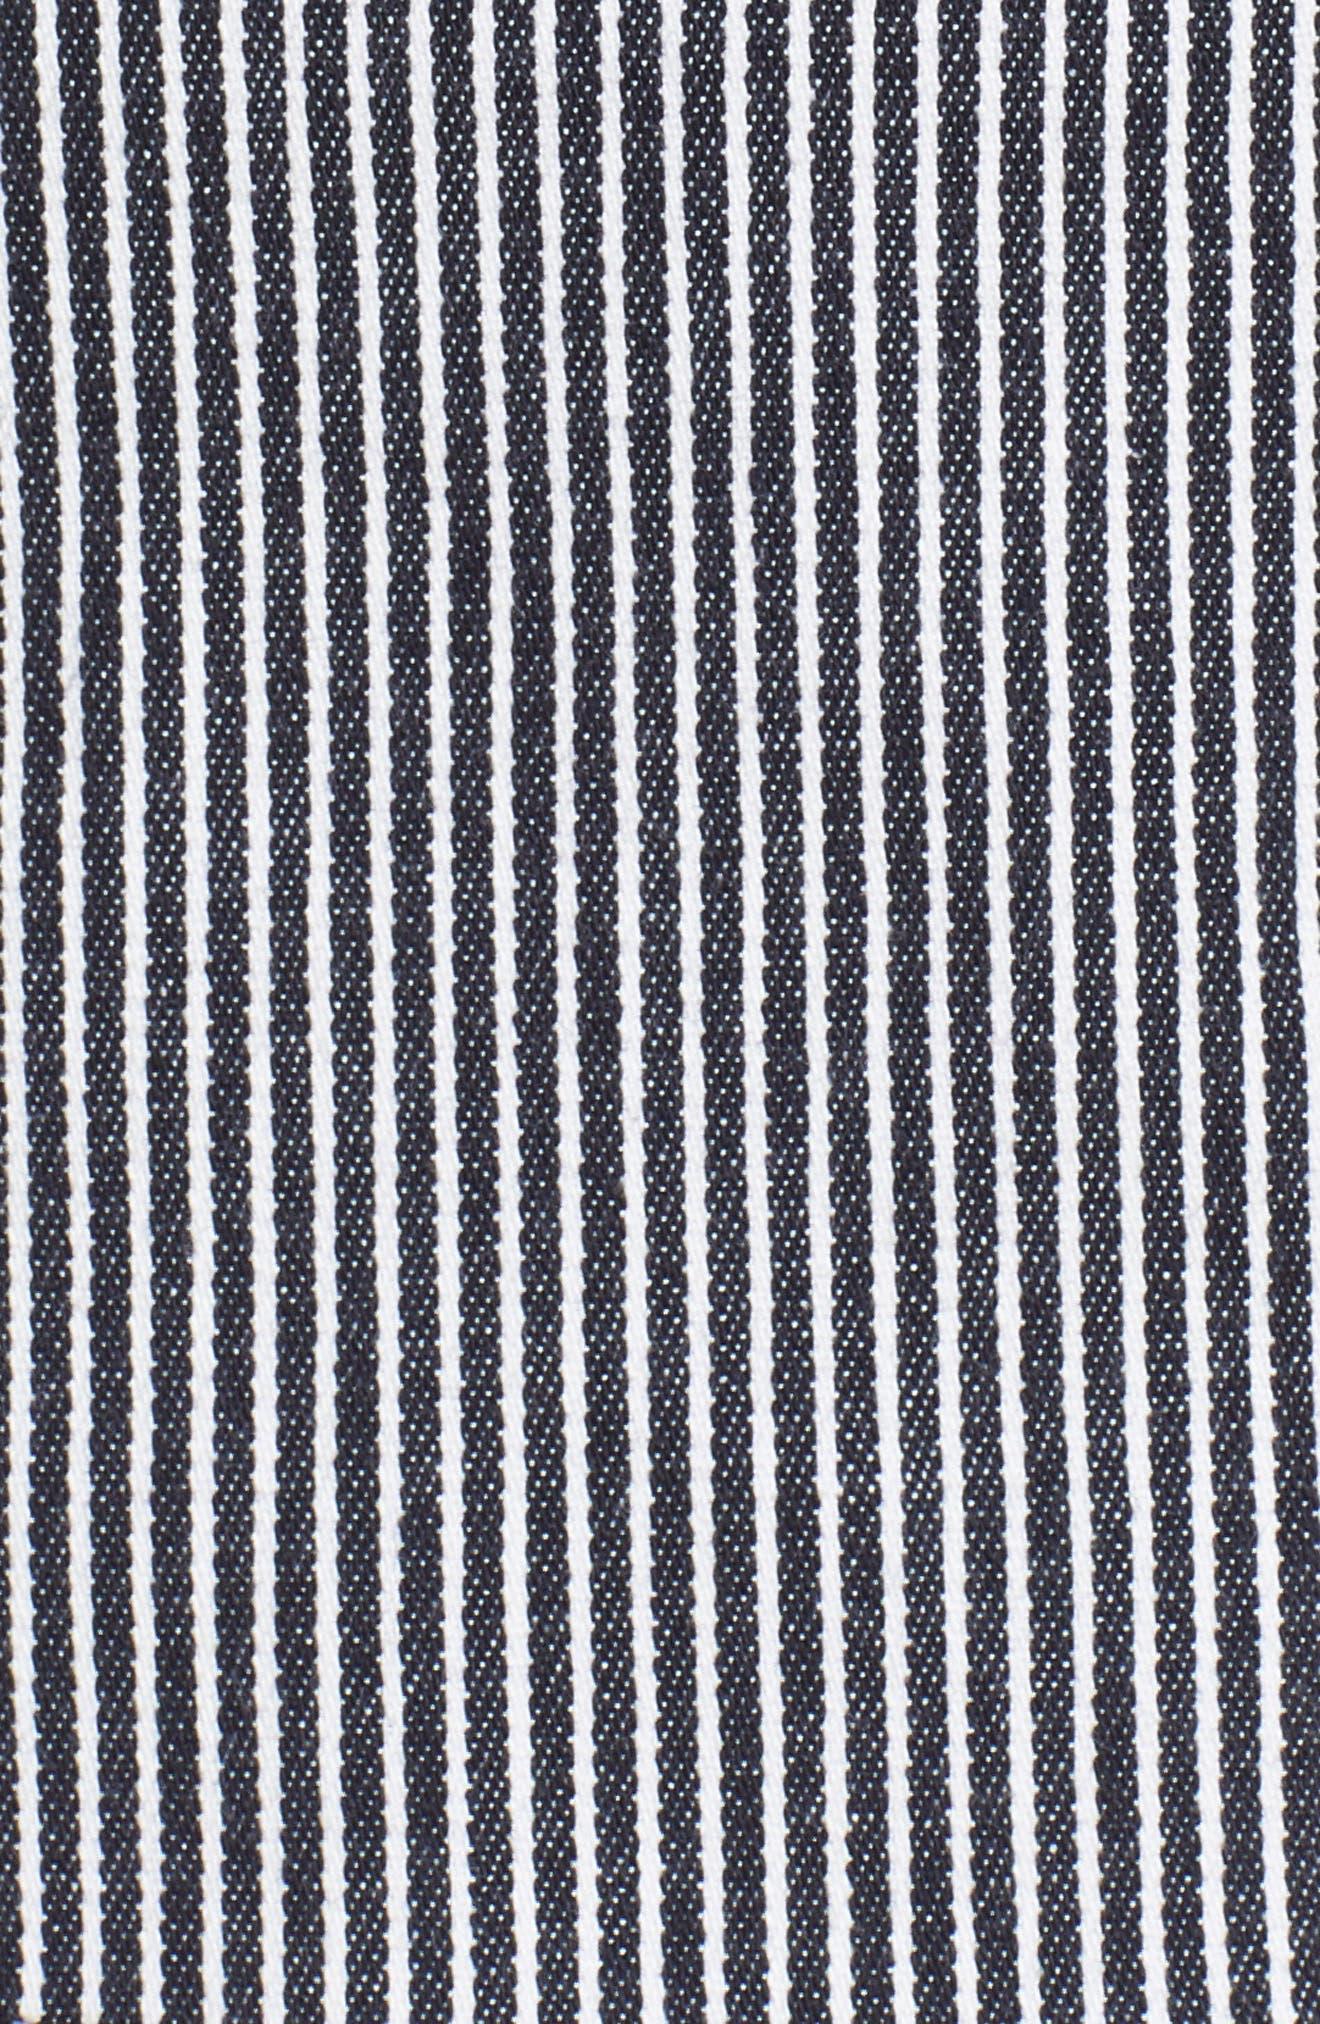 Katemika Stripe Stretch Cotton Suit Jacket,                             Alternate thumbnail 6, color,                             Navy Fantasy